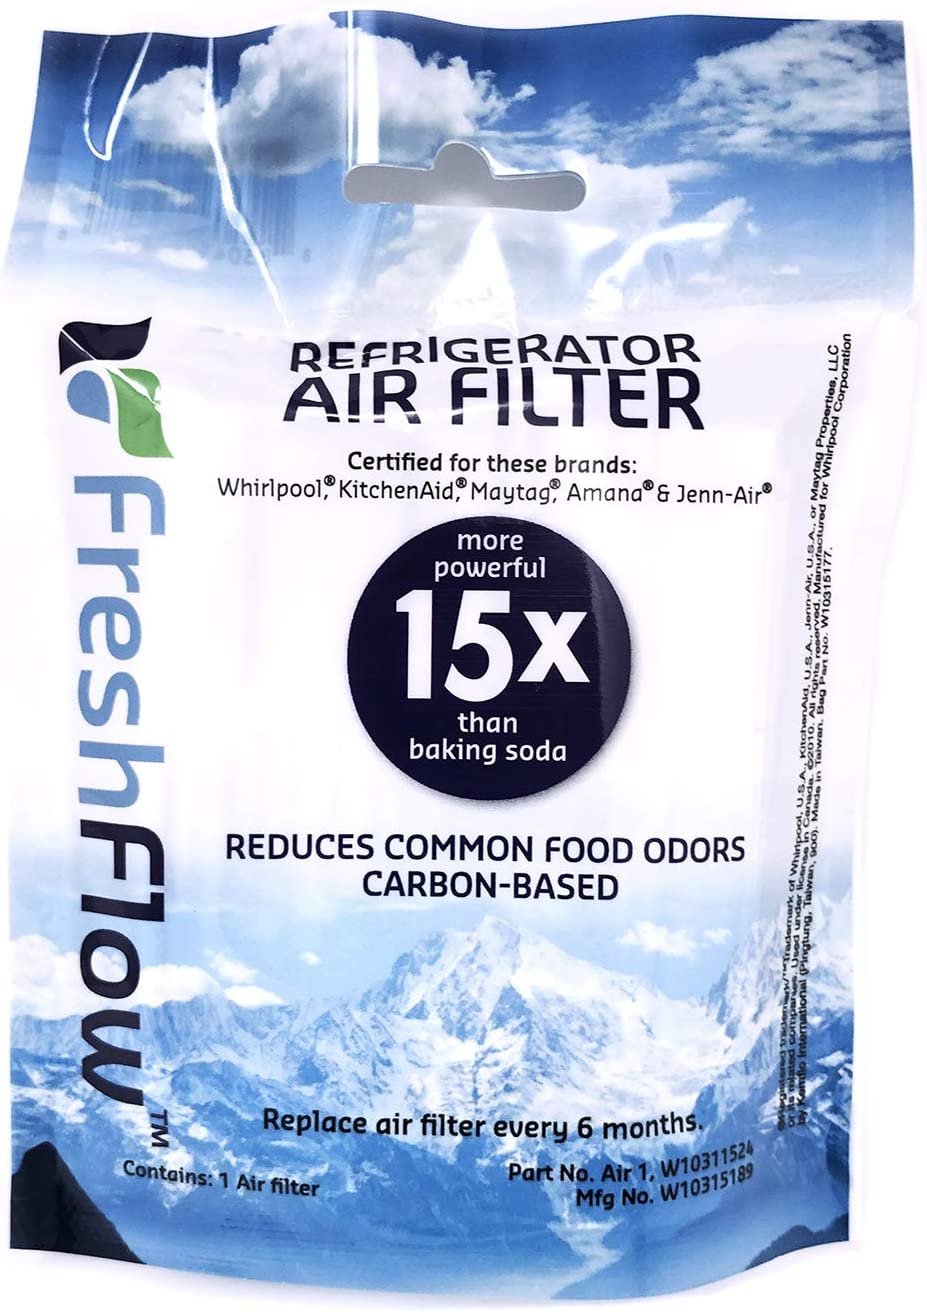 EveryDrop Water Filter 100/% GENUINE USA SELLER Whirlpool EDR2RXD1 Filter #2